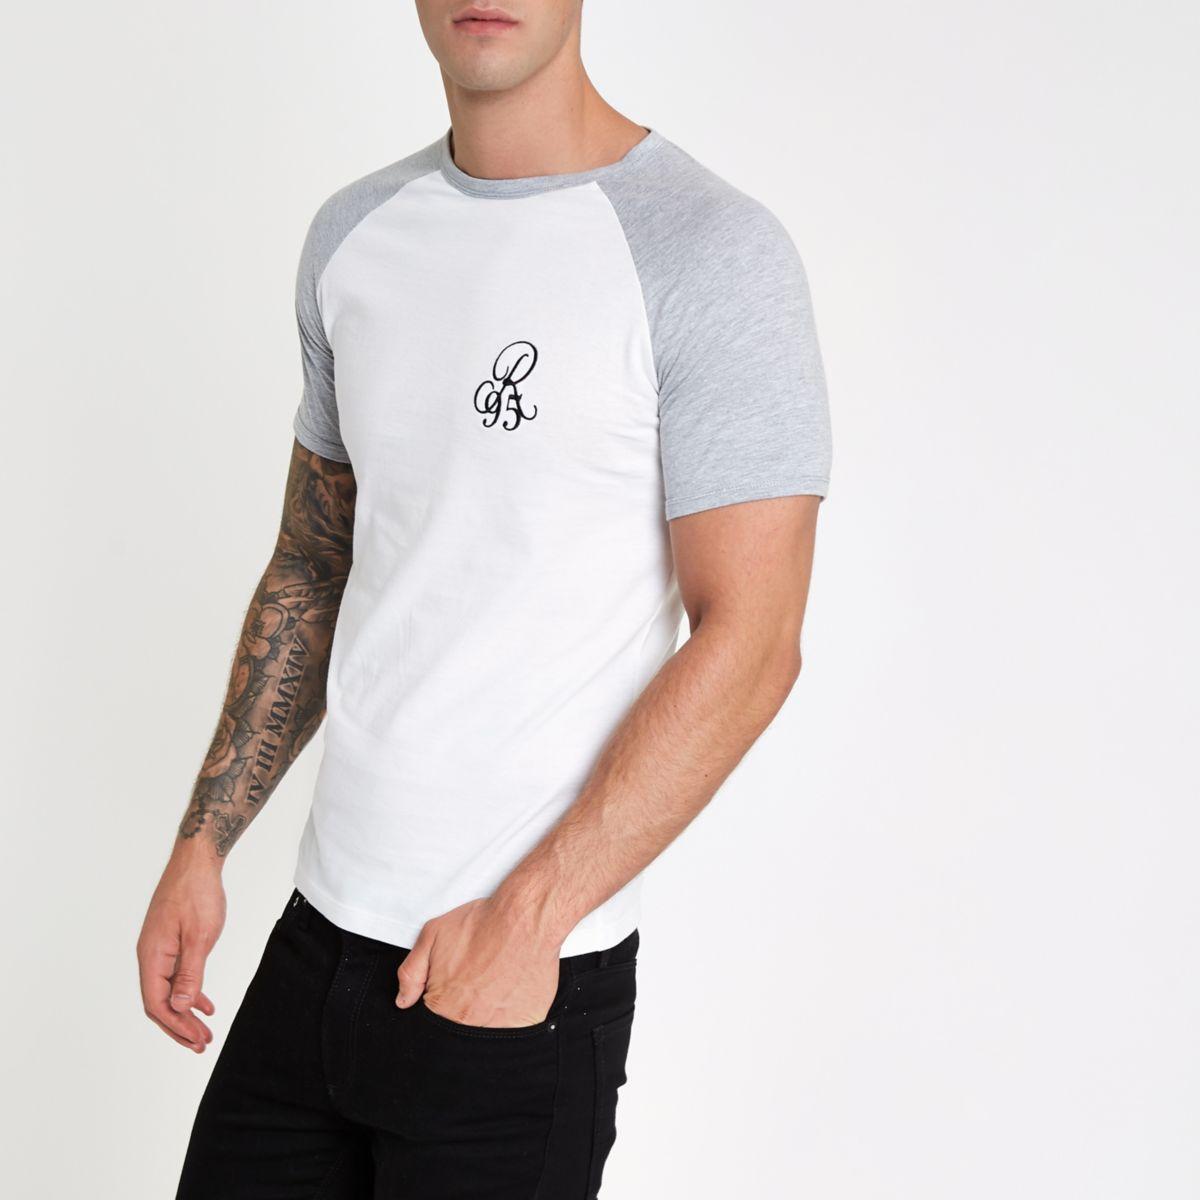 White muscle fit 'R95' raglan T-shirt